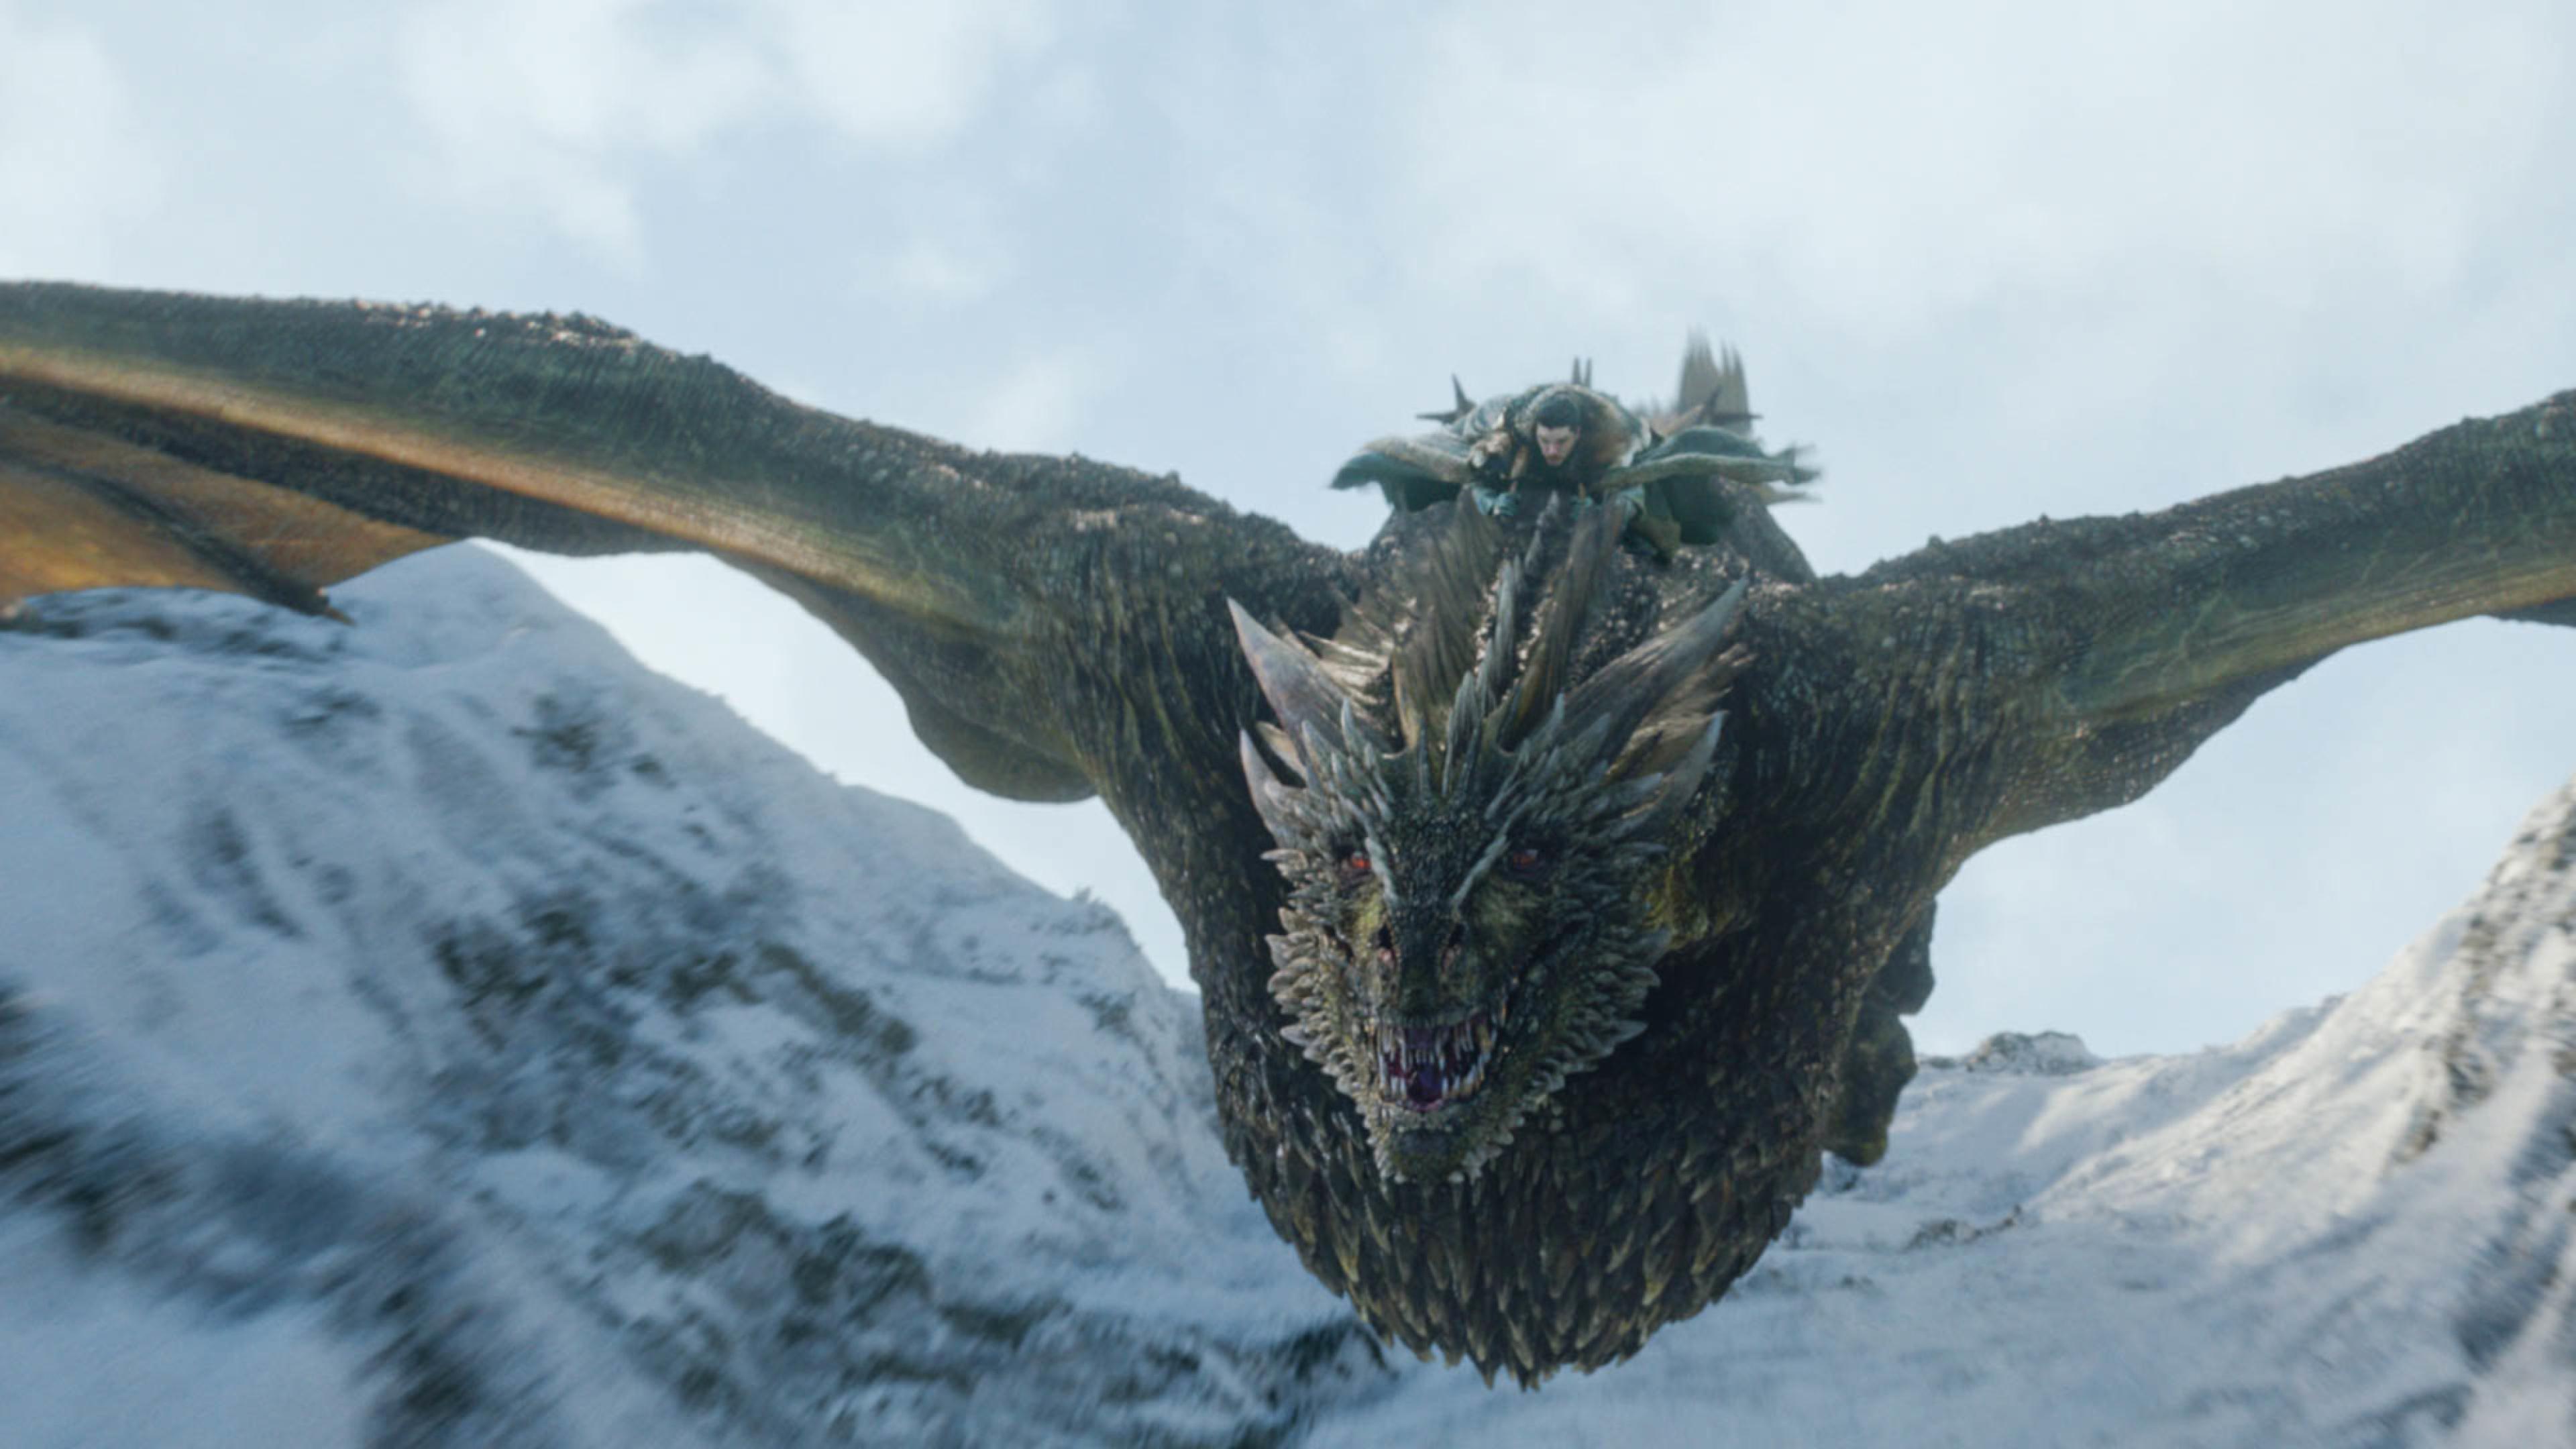 3840x2160 Jon Snow Flying Dragon 4k Image Hd Tv Series 4k